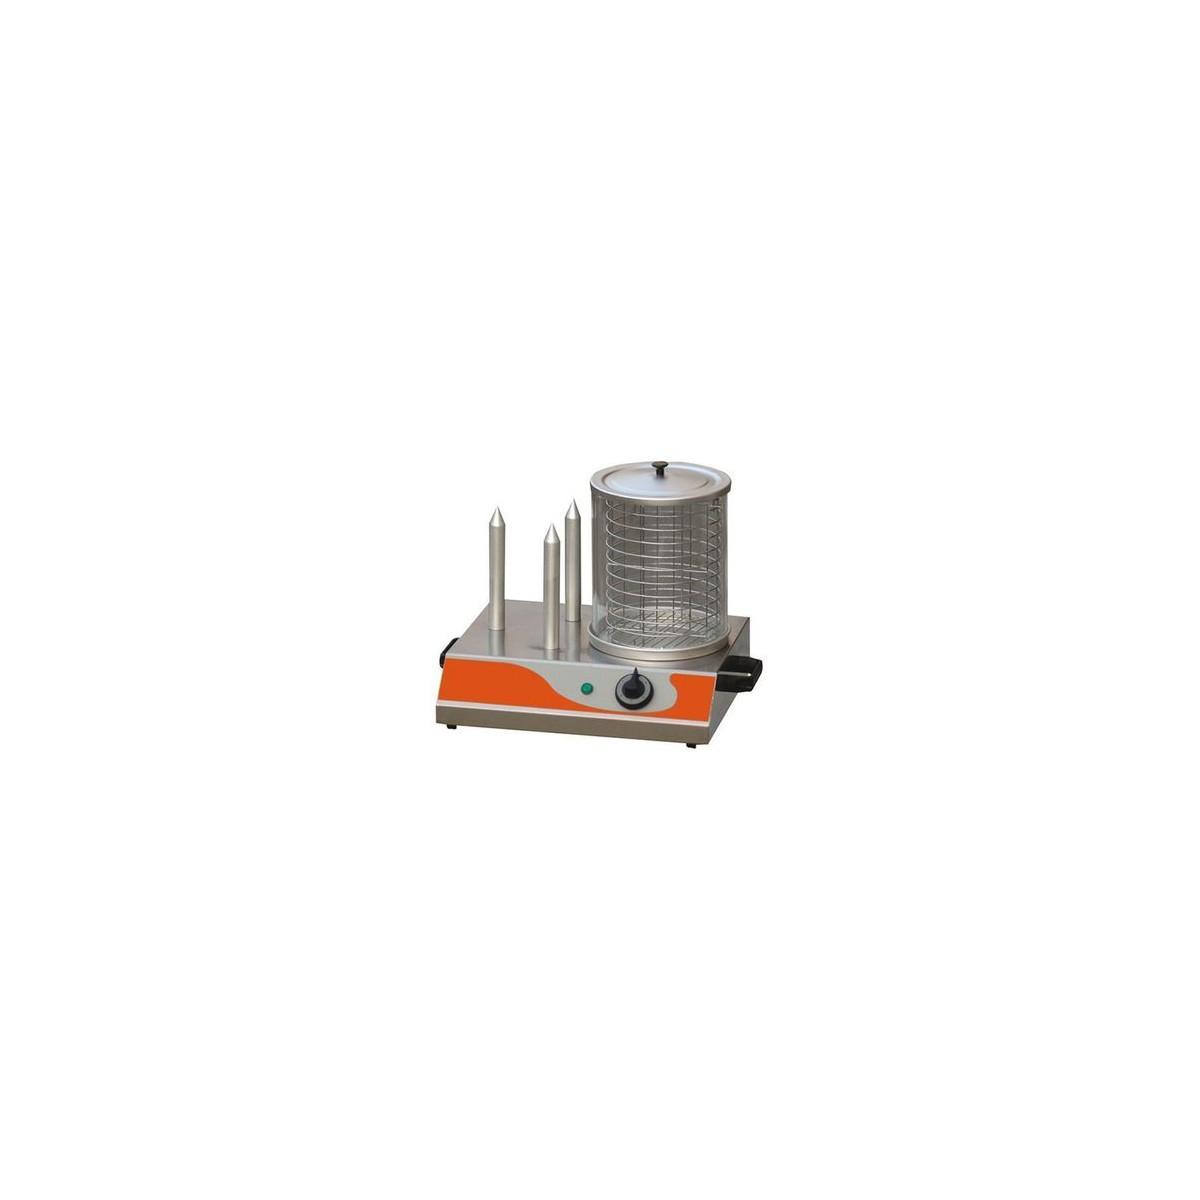 machine hot dog professionnel electrique 230v 3 plots gastromastro. Black Bedroom Furniture Sets. Home Design Ideas